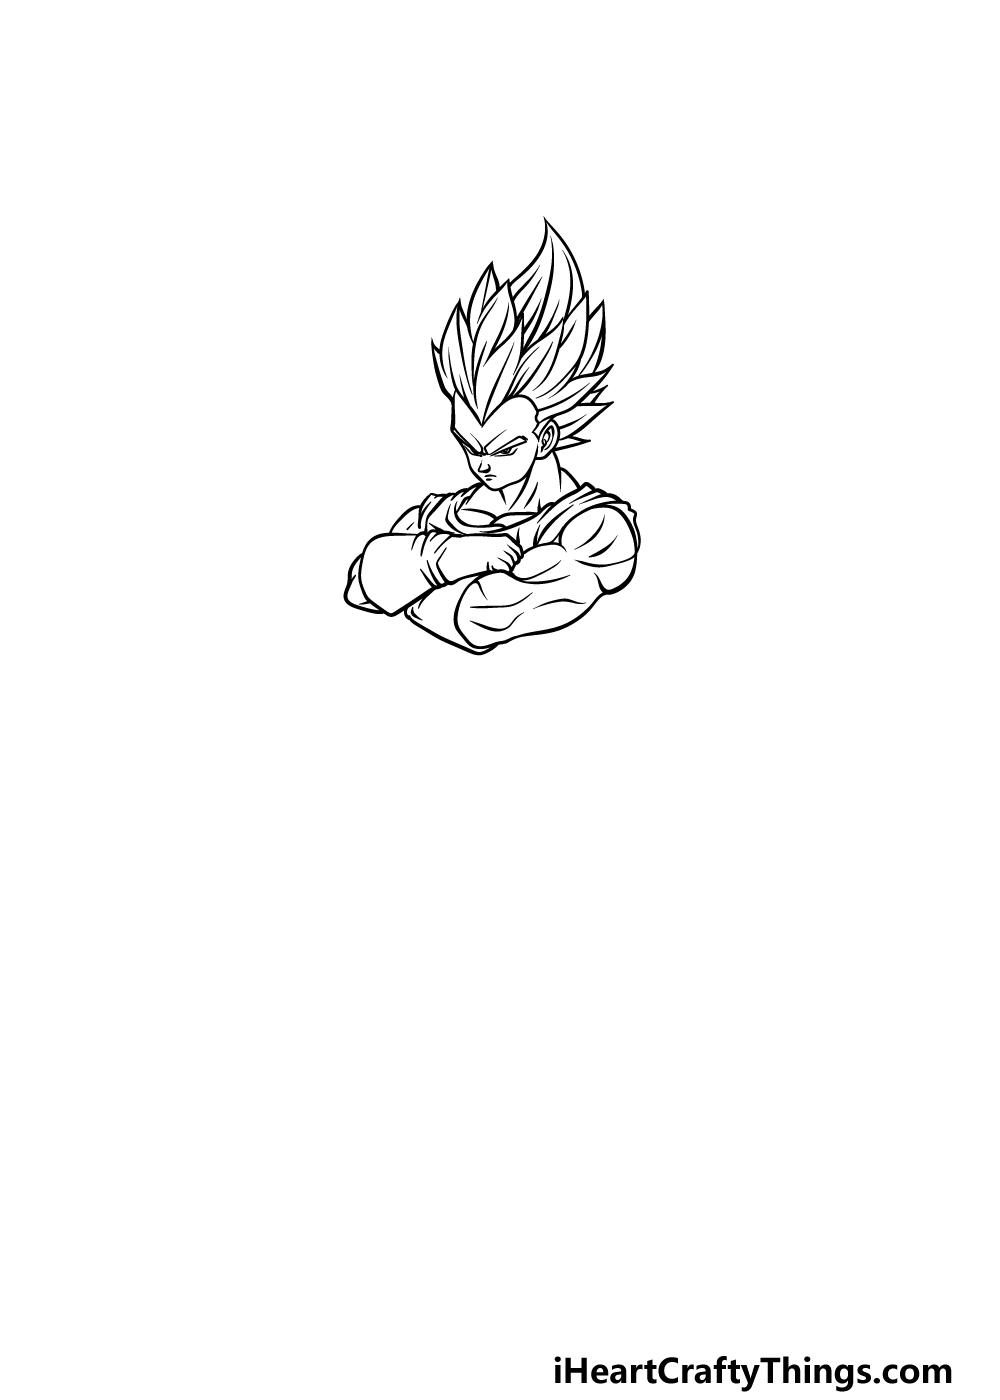 drawing Vegeta step 2